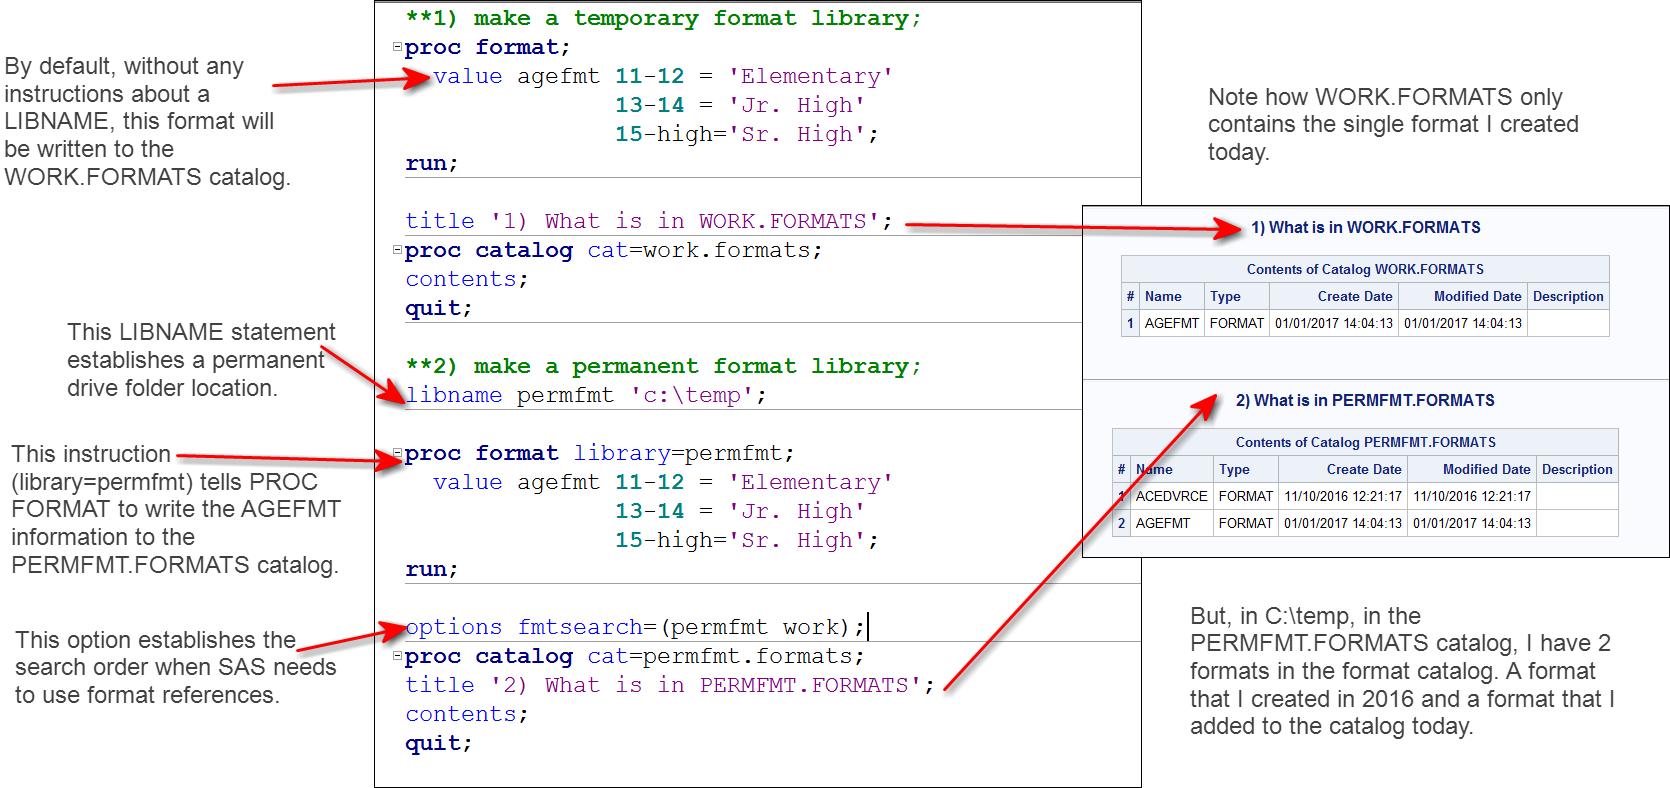 format_catalog.png